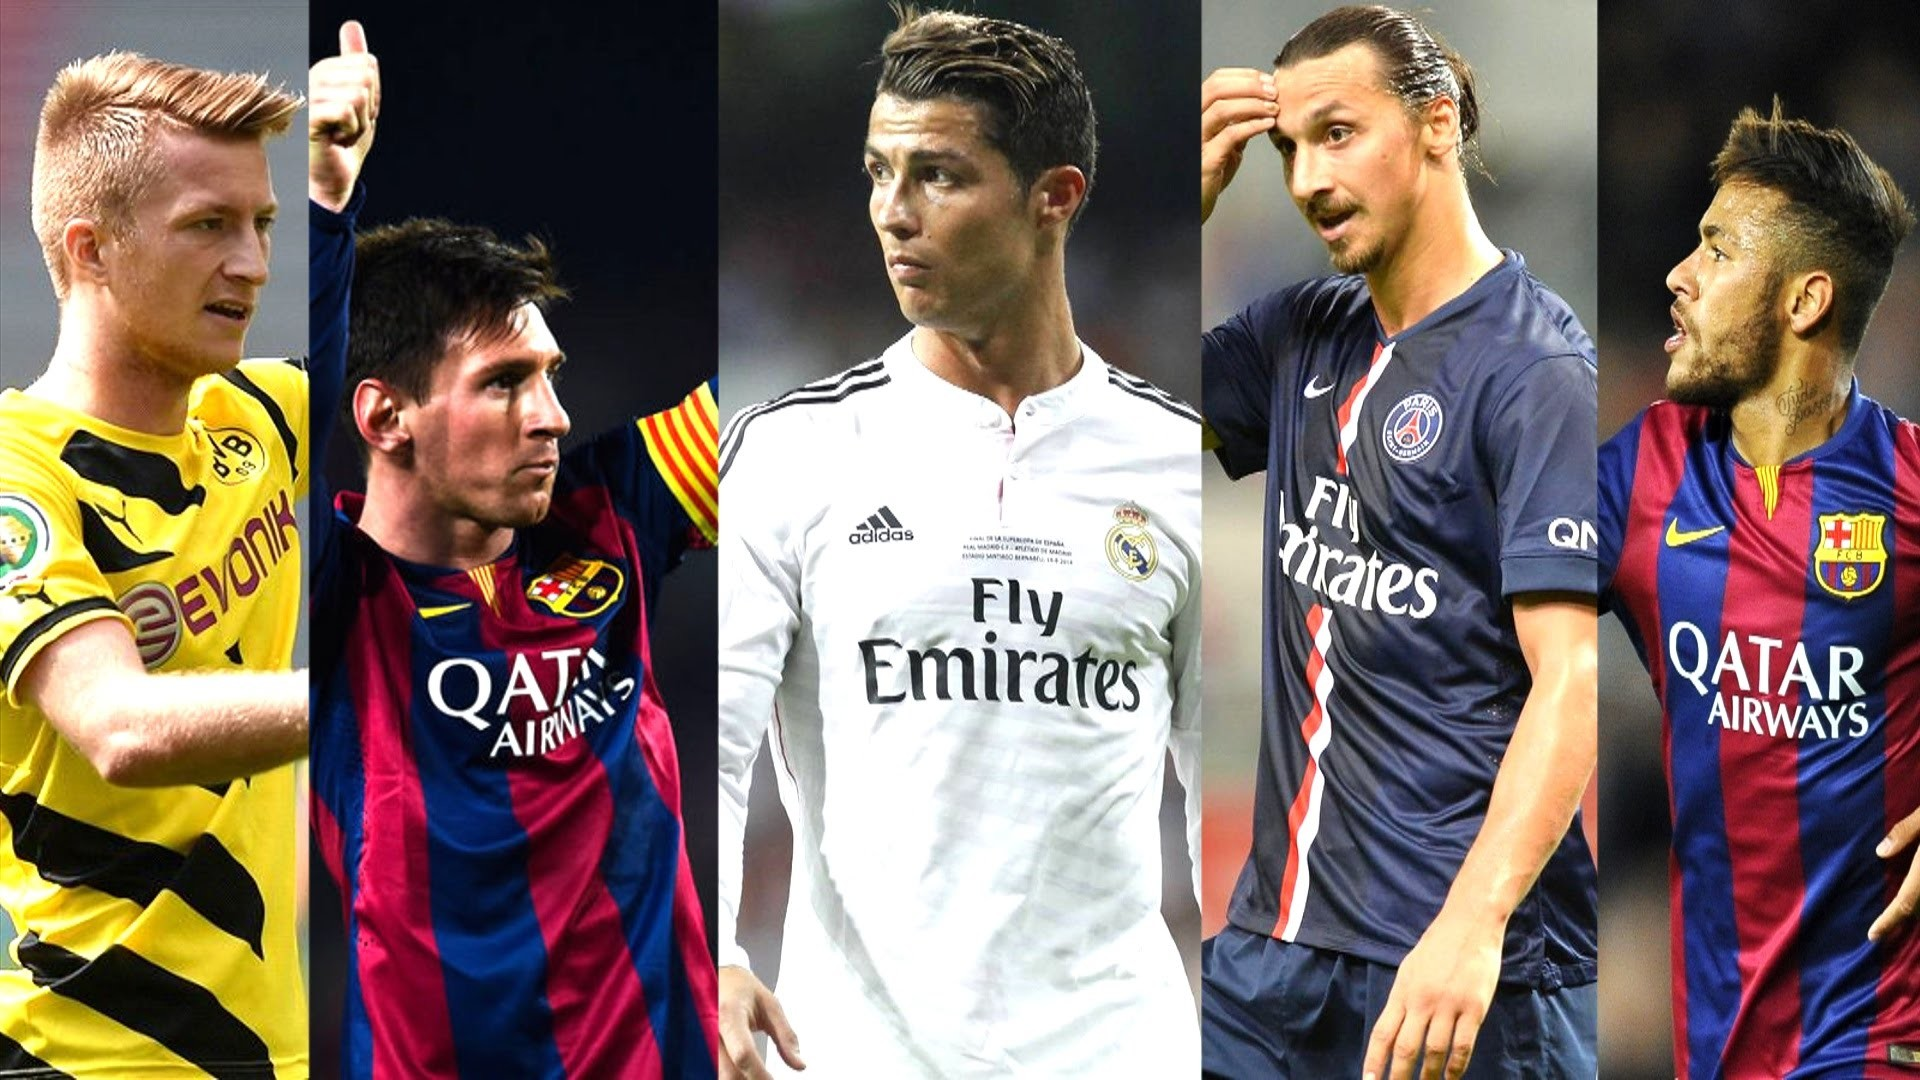 Best Football Skill Show 2015 ○ Ronaldo ○ Messi ○ Neymar ○ Bale ○ Robben ○  Ibrahimovic ○ HD